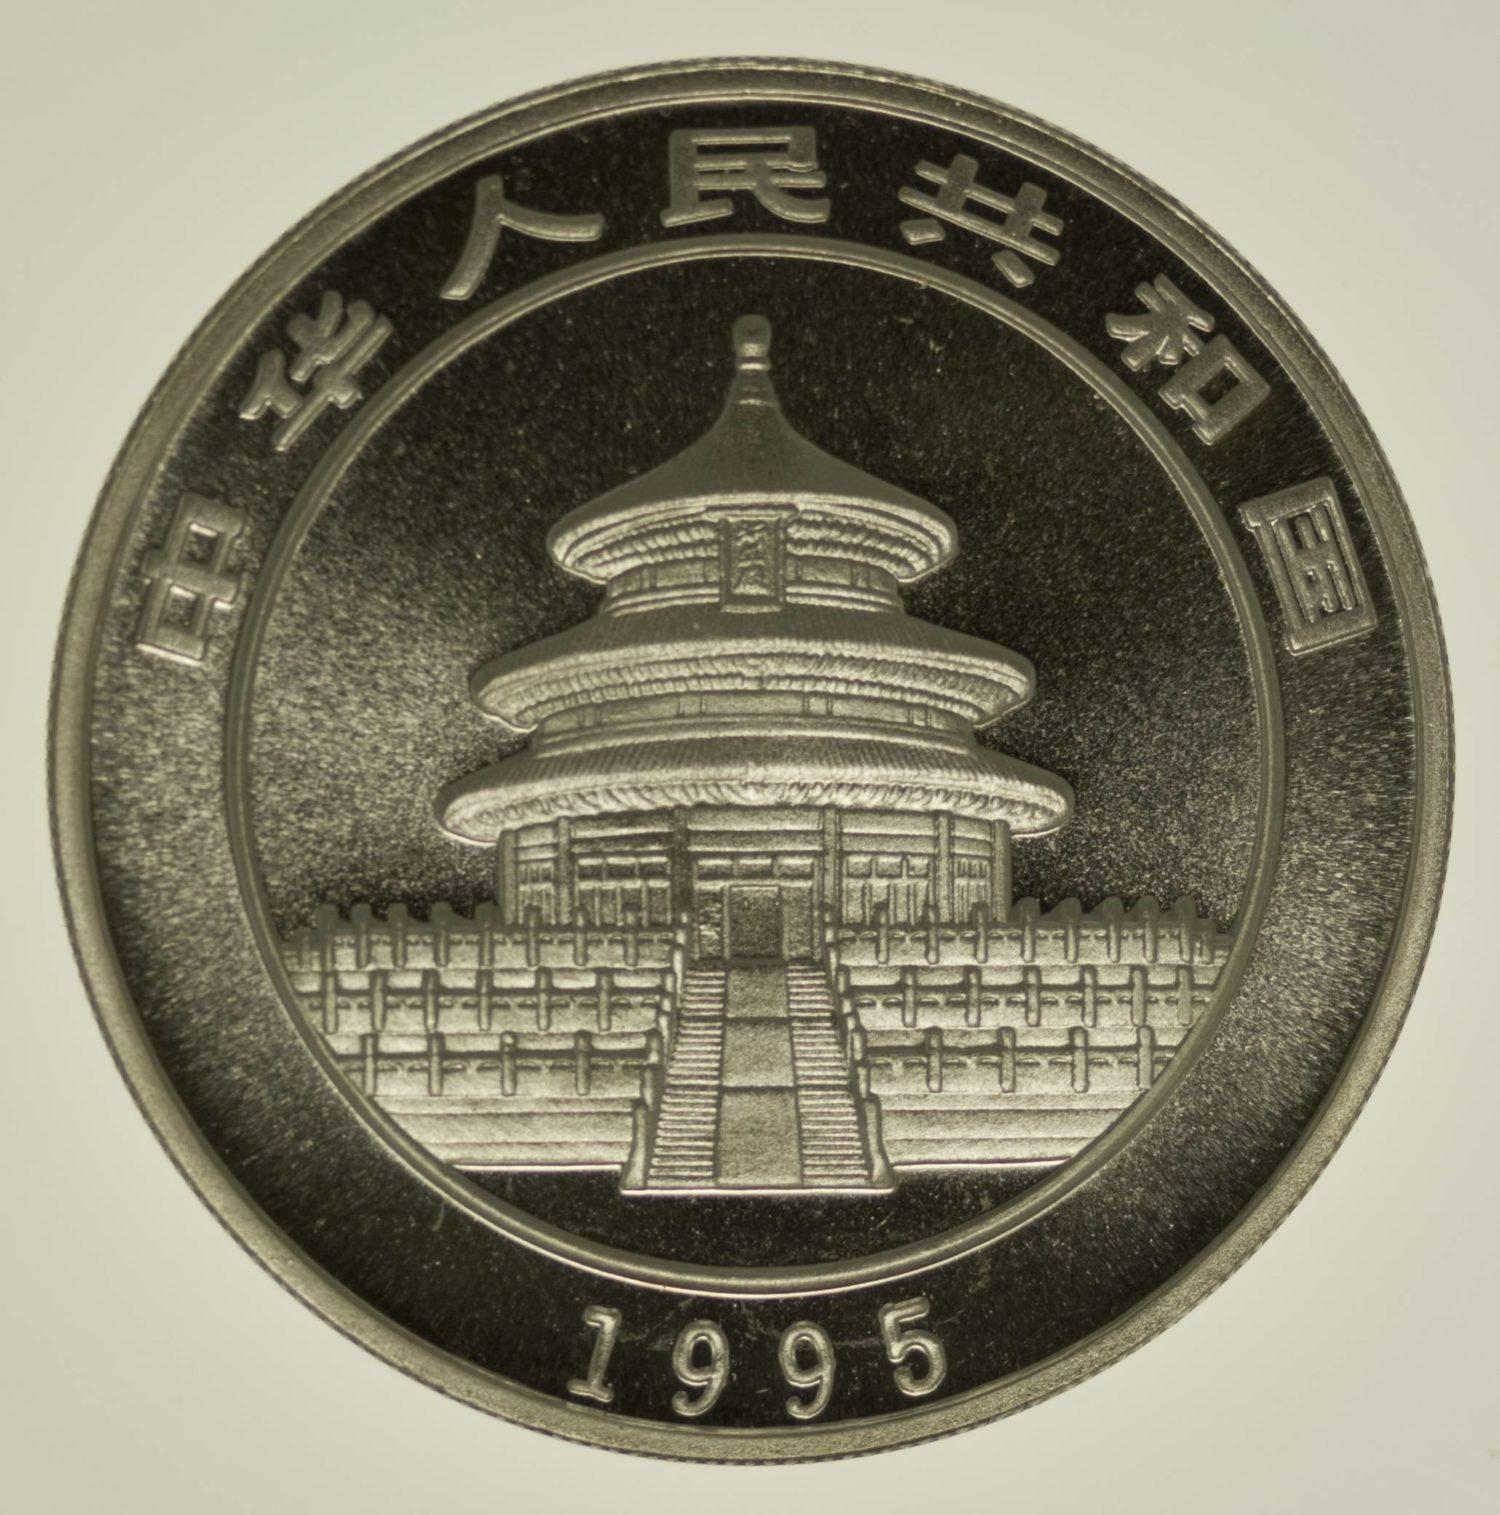 1 Unze Silbermünze China Panda 1995, 10 Yuan 31,1 Gramm Silber RAR